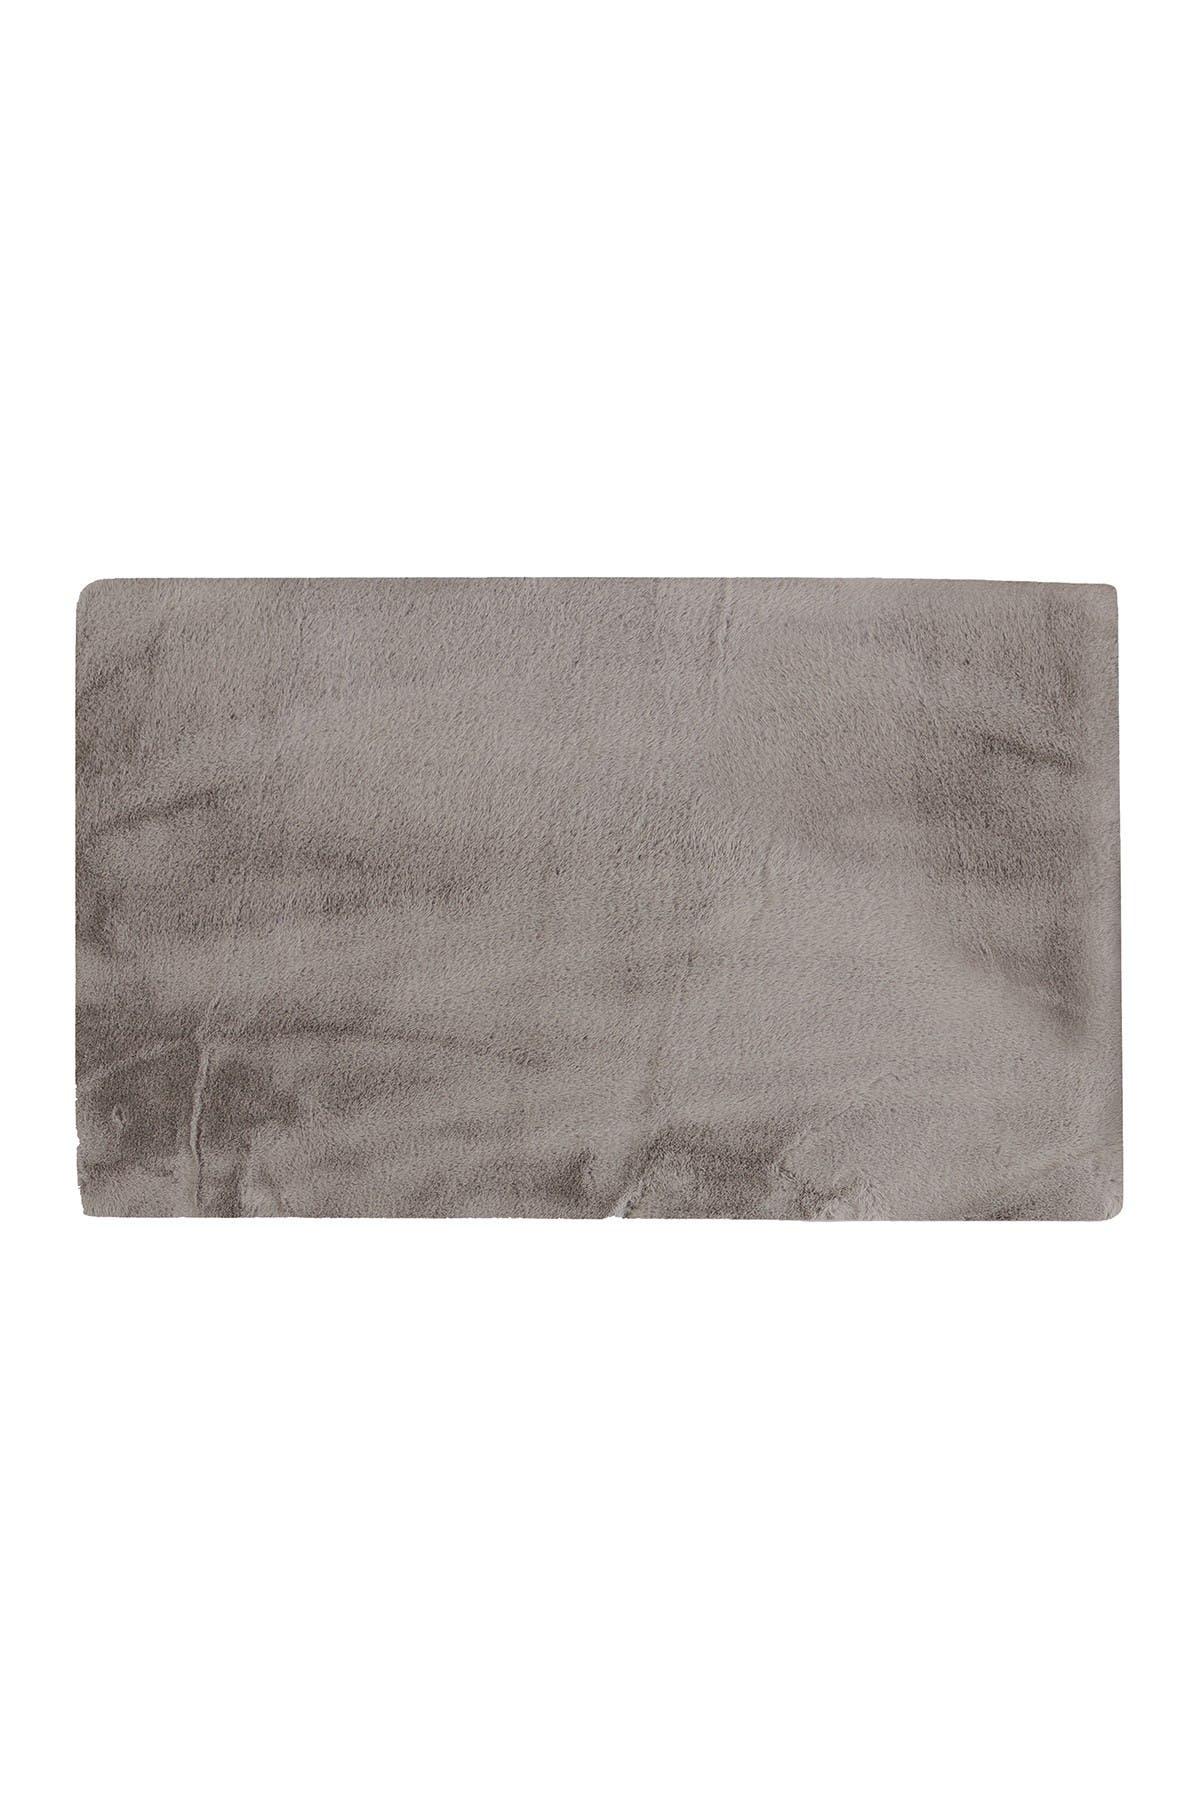 Image of LUXE Faux Fur Rectangular Throw 3' X 5' - Grey